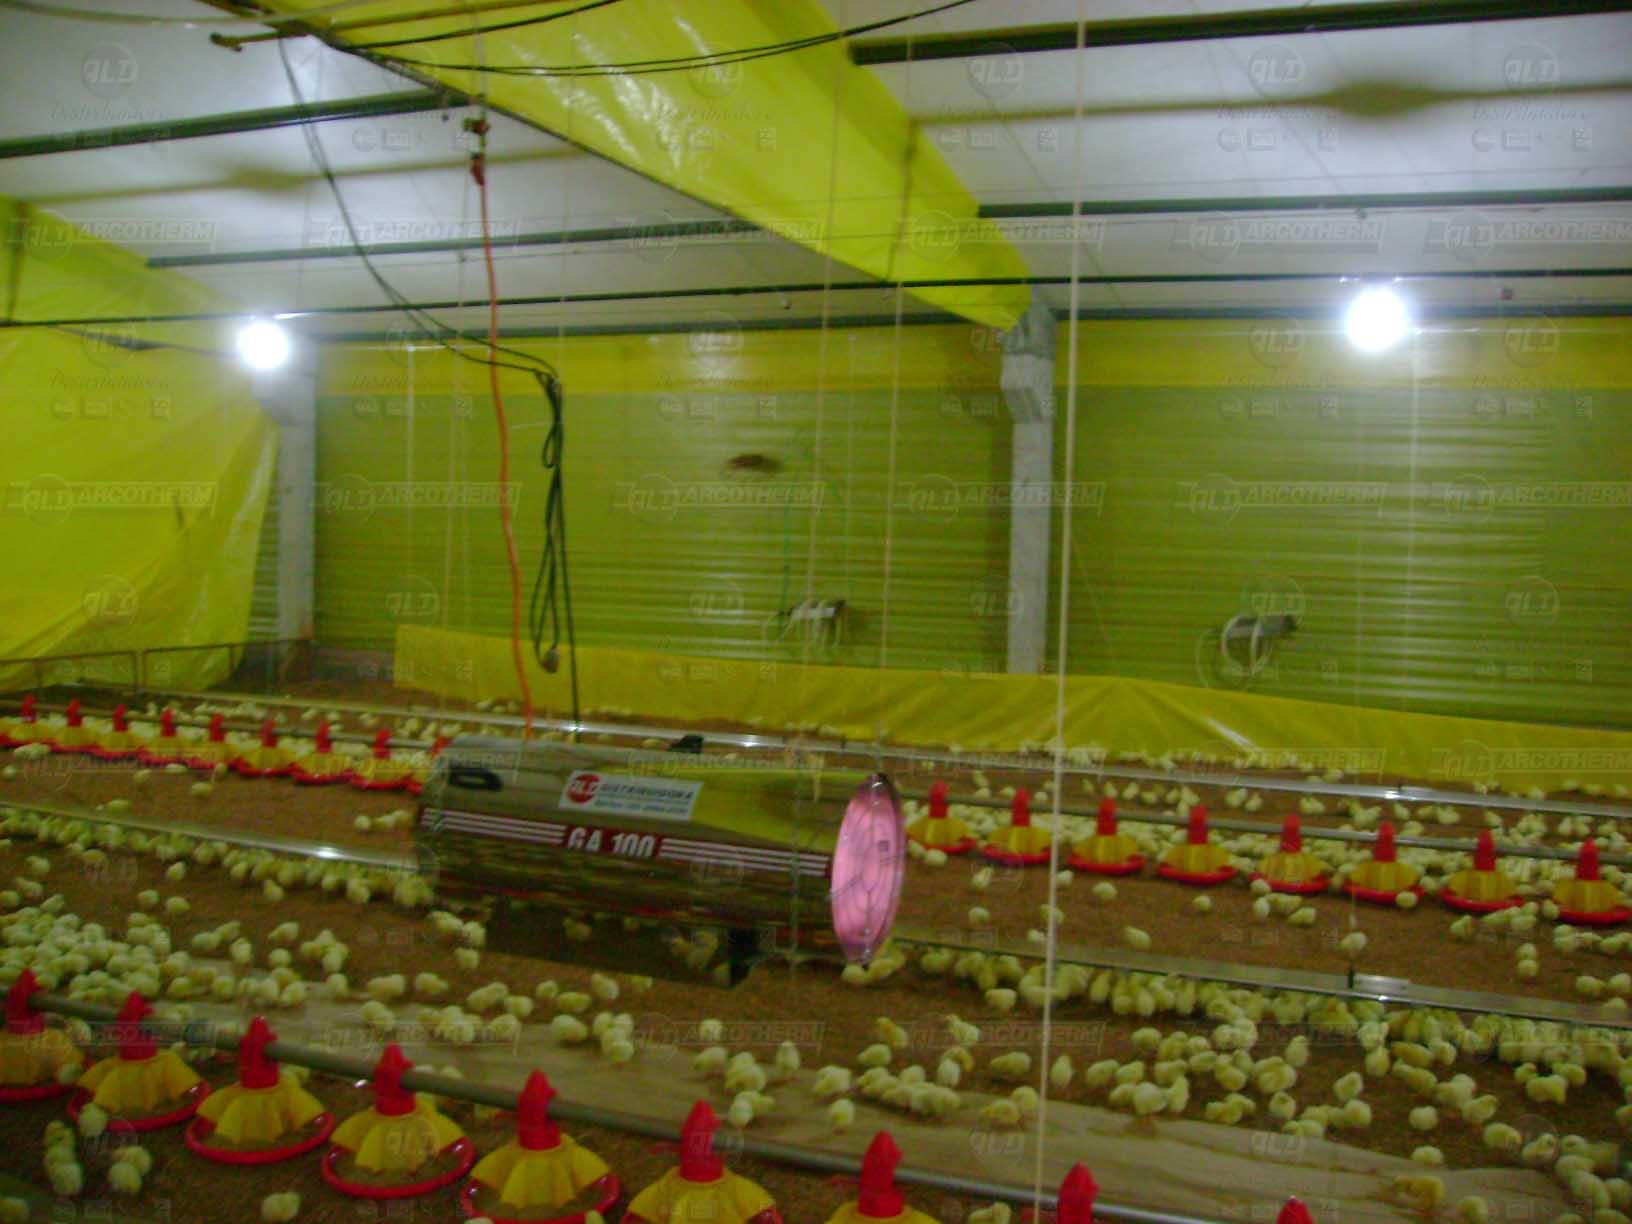 Granja - galpao frango de corte - aquecedor - gerador de ar quente - arcotherm- 4